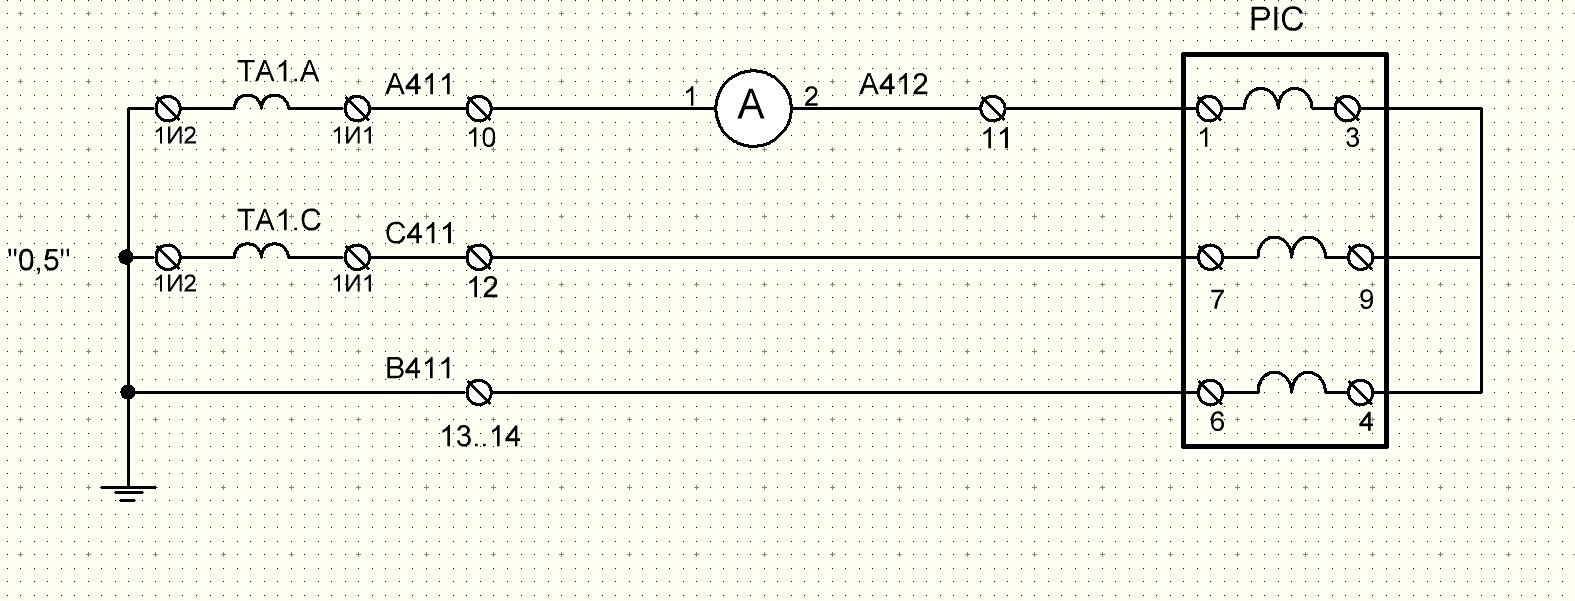 схема подключения счётчика через тт